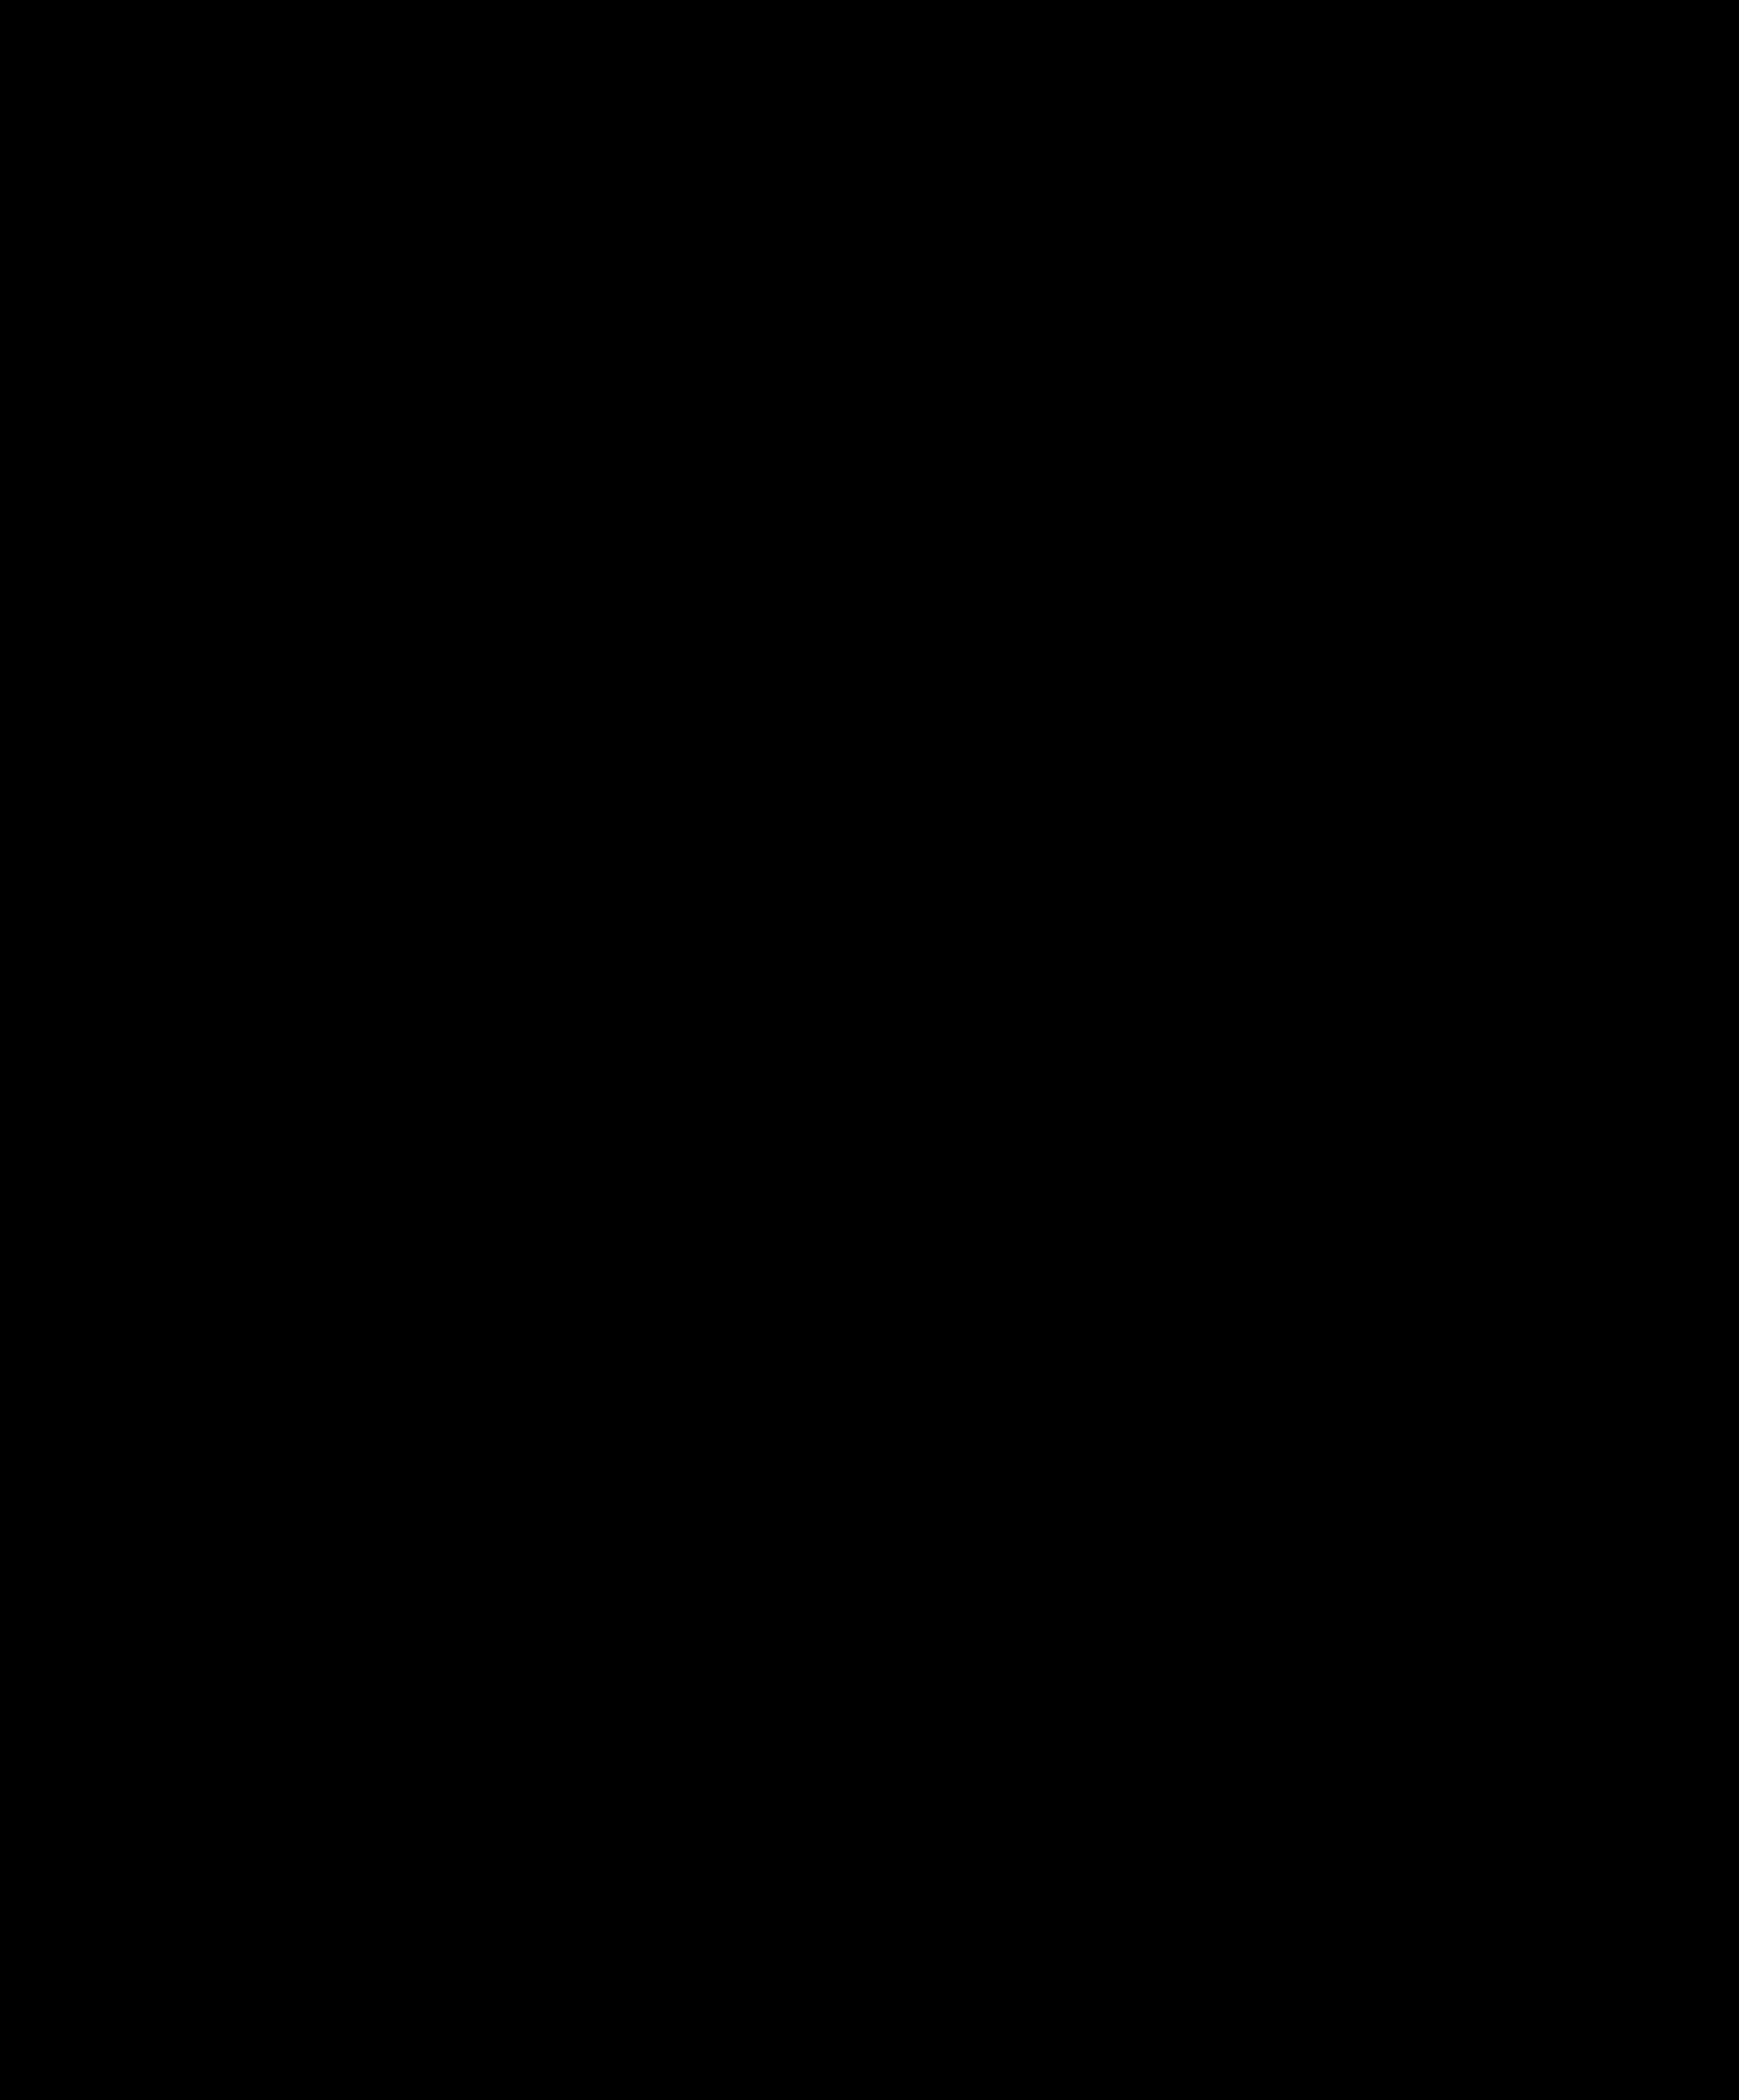 Dog silhouette big image. Pet clipart 3 animal